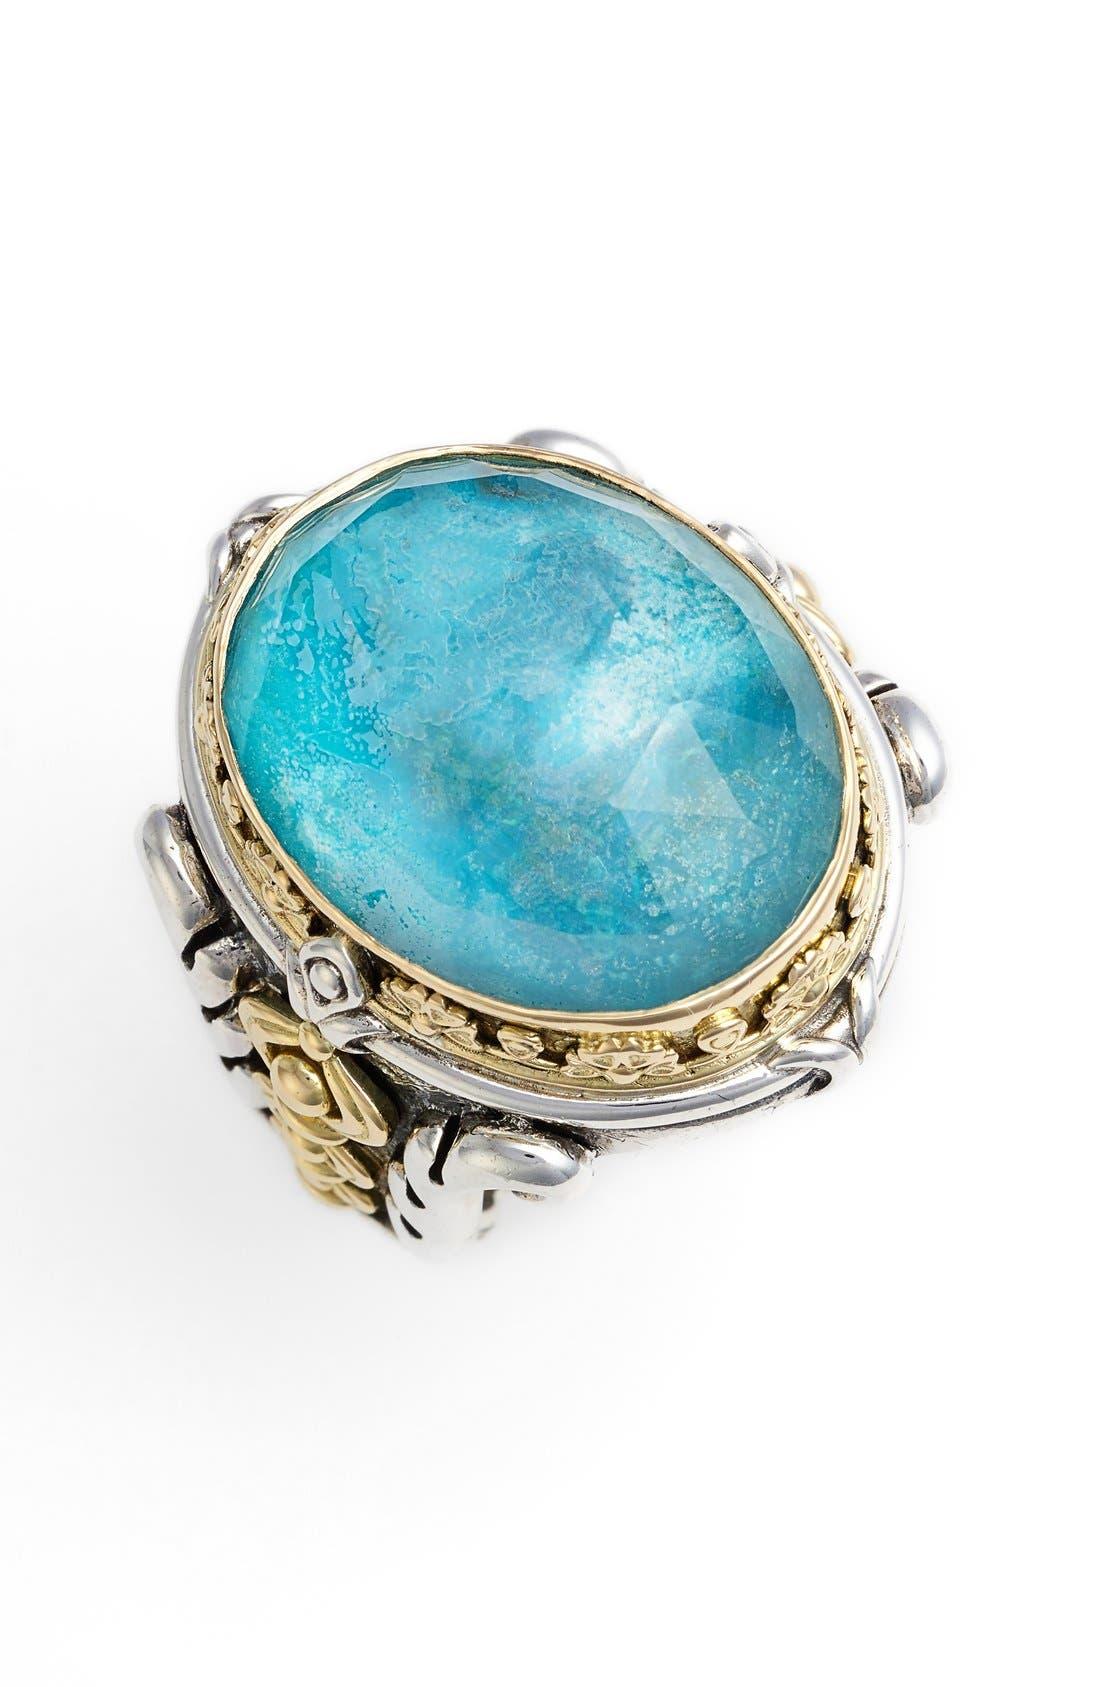 'Iliada' Large Oval Semiprecious Stone Ring,                         Main,                         color, Blue/ Green